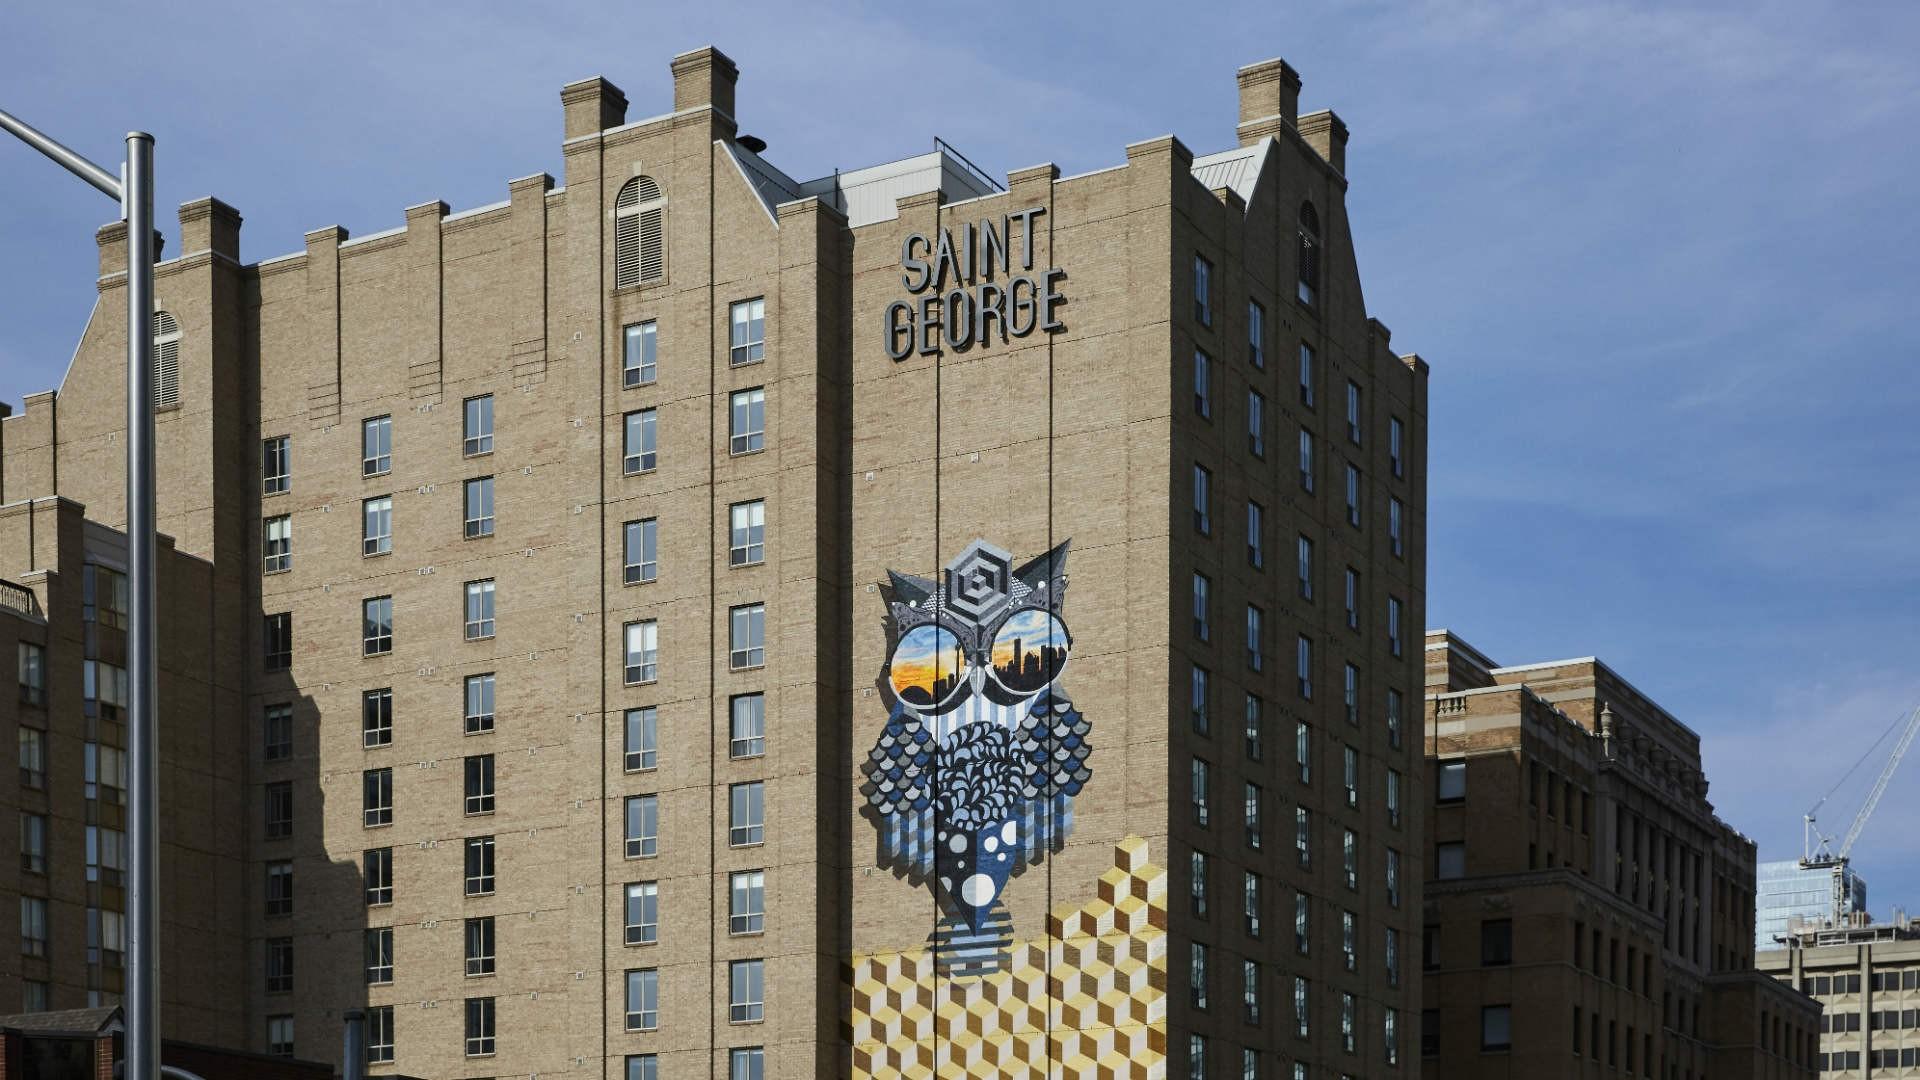 Hotel review: the Kimpton Saint George hotel, Toronto | Graffiti by BirdO on the exterior of Kimpton Saint George